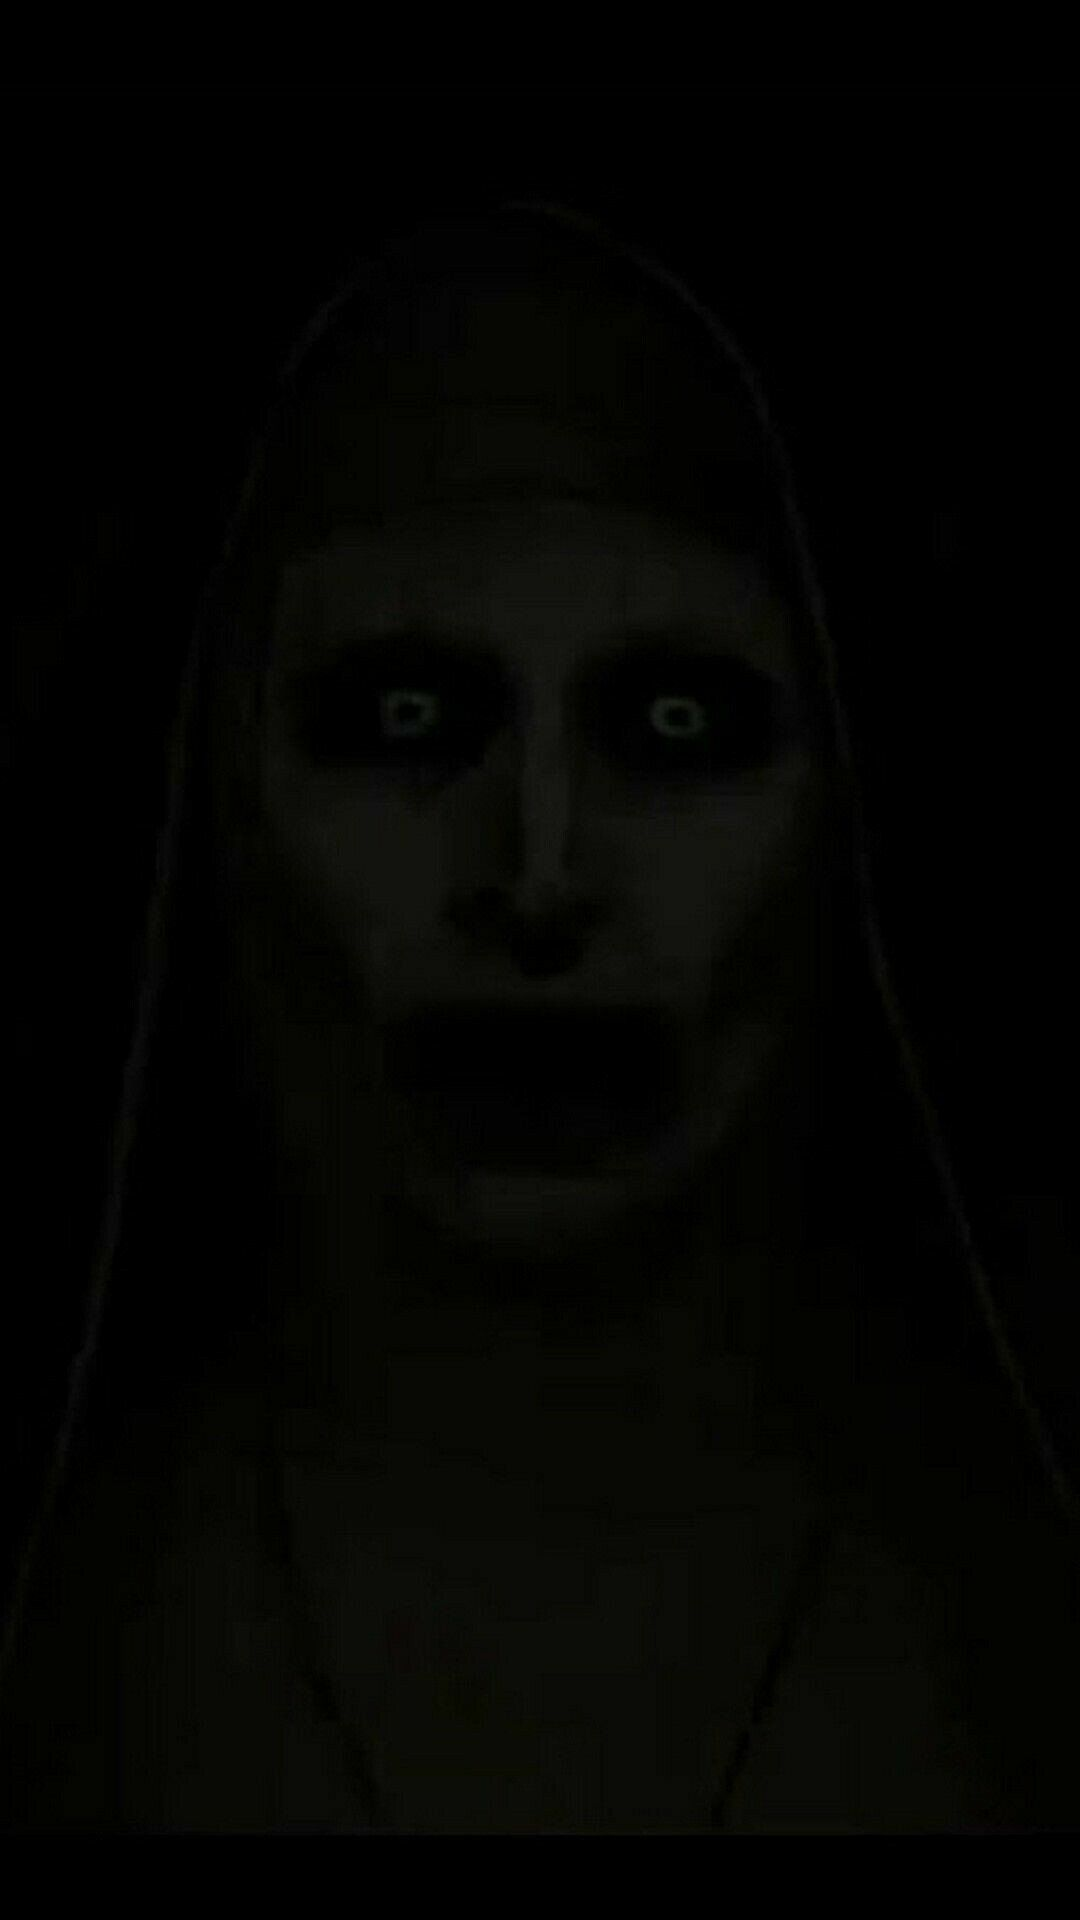 خلفيات رعب Horror مخيف Scary مرعب عالية الوضوح 226 Em 2020 Papel De Parede Terror Wallpaper De Terror Fotos Assustadoras